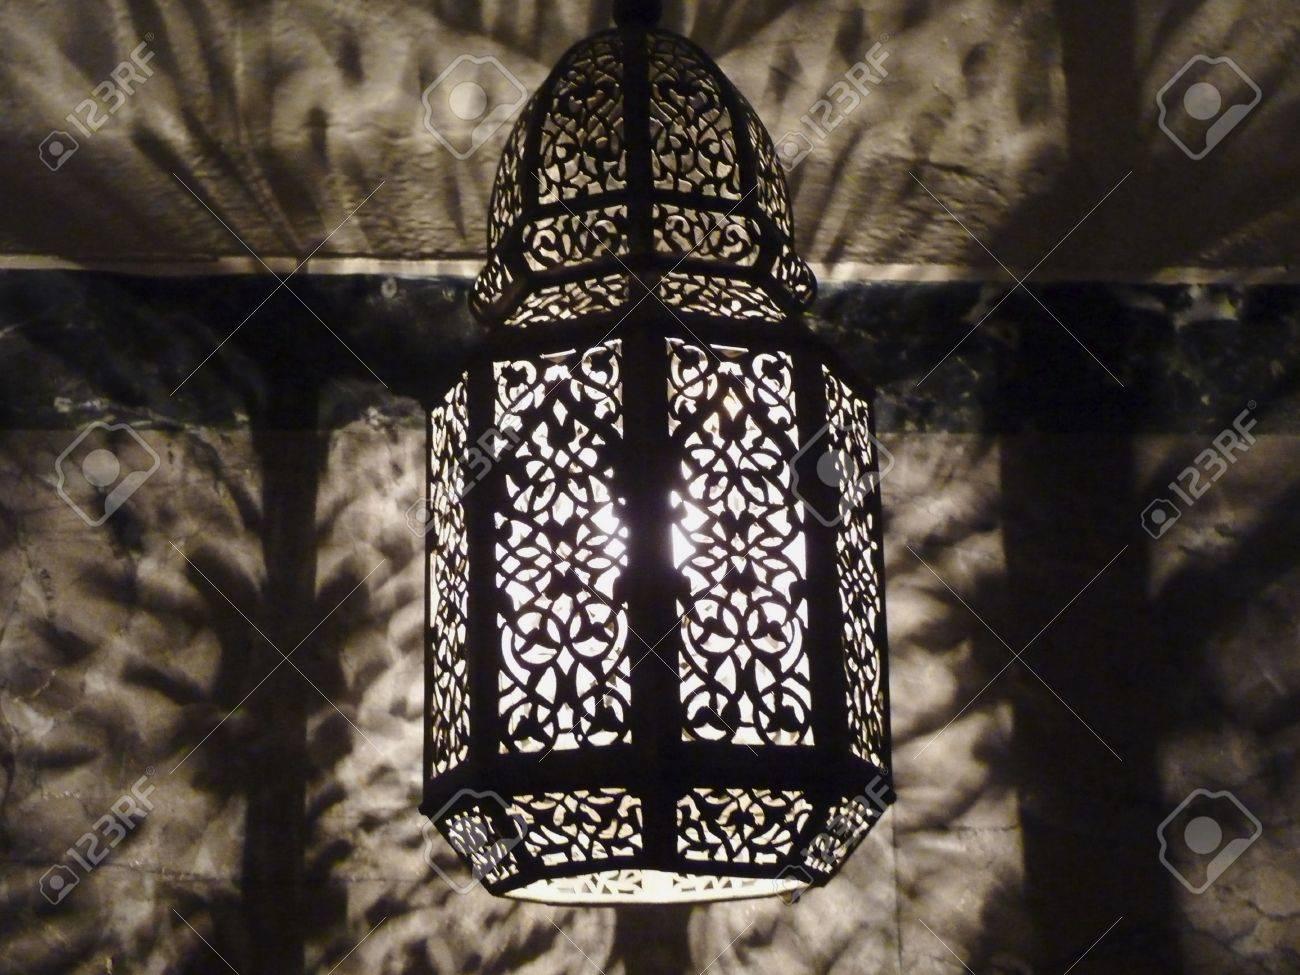 Moroccan Ornate Pierced Metal Filigree Lamp Casting Intricate ...